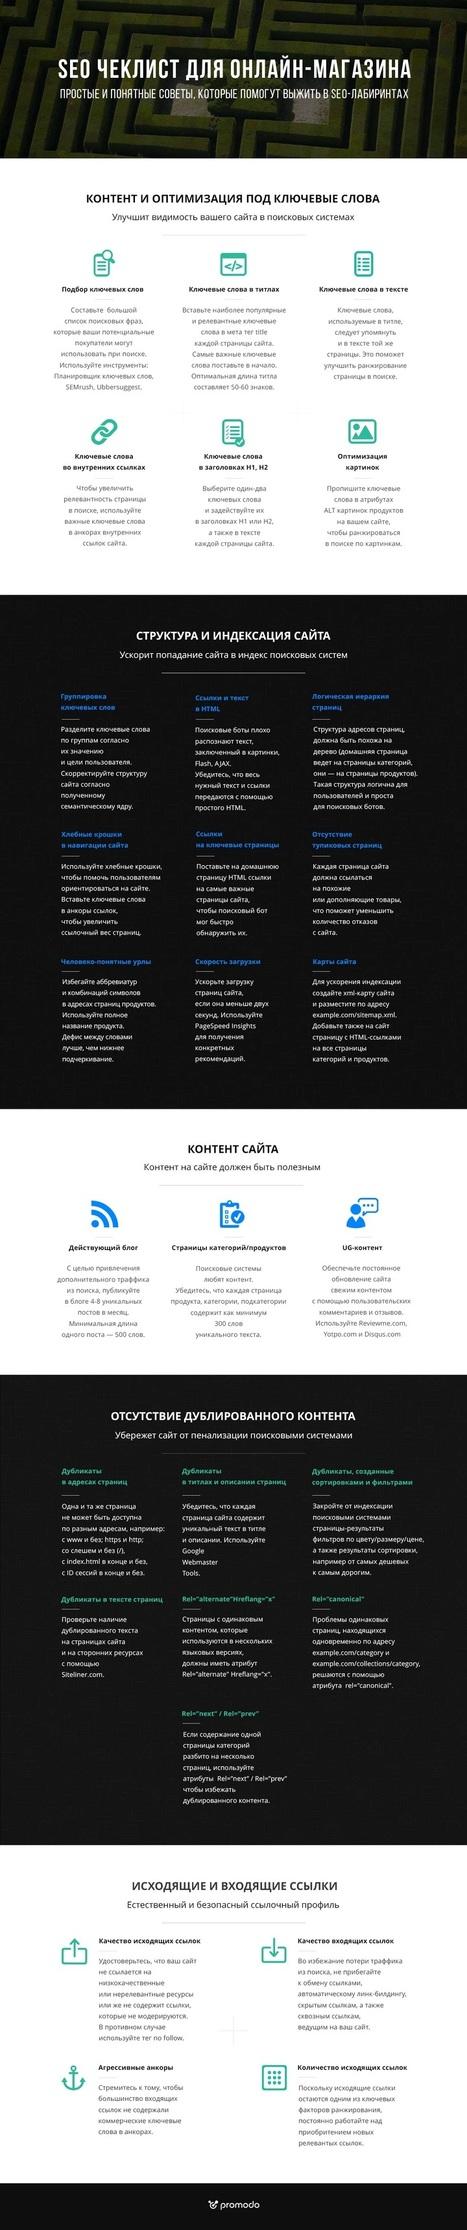 SEO-оптимизация для интернет-магазинов   Transmedia, Content marketing & Digital AD   Scoop.it